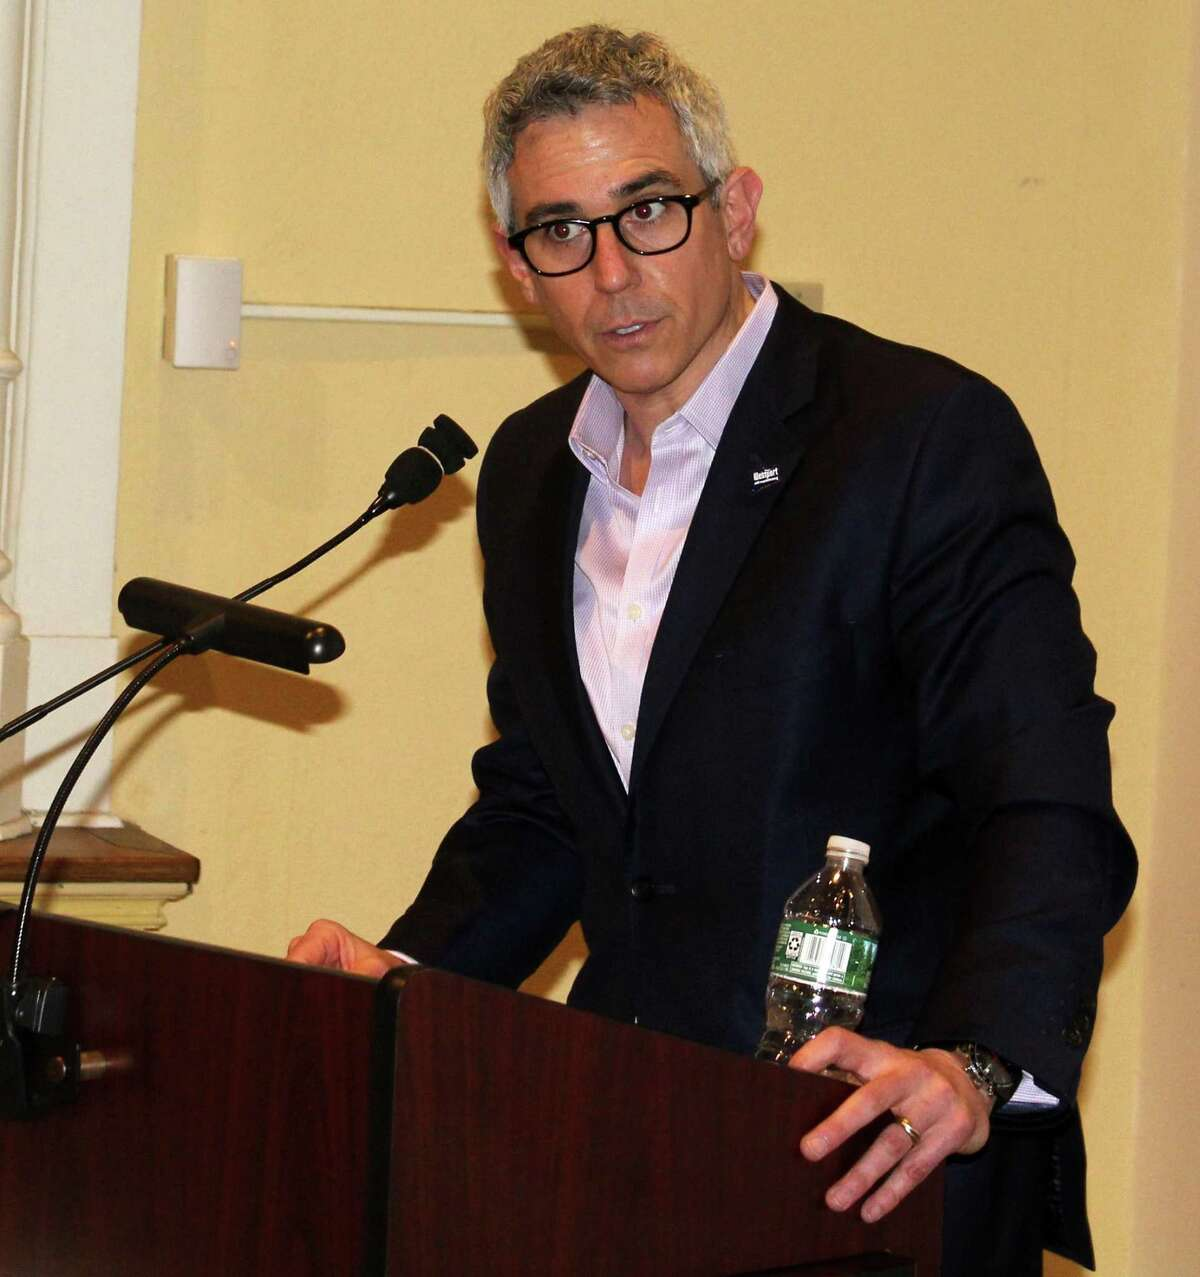 RTM member Greg Kraut speaks at the April 3 meeting in Town Hall.